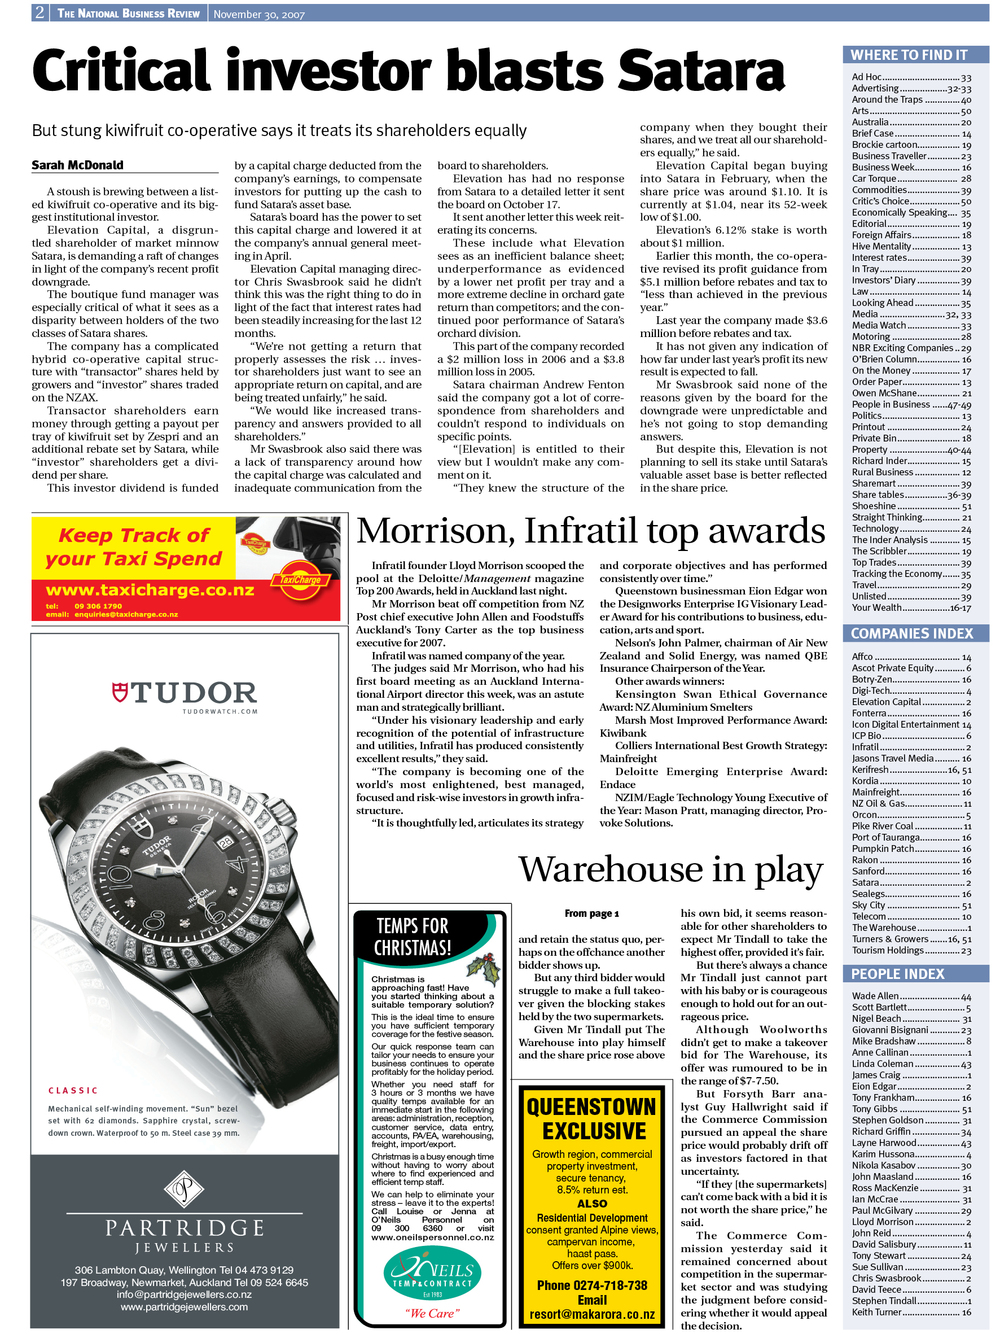 "NBR: ""Critical Investor blasts Satara"" - November 2007"